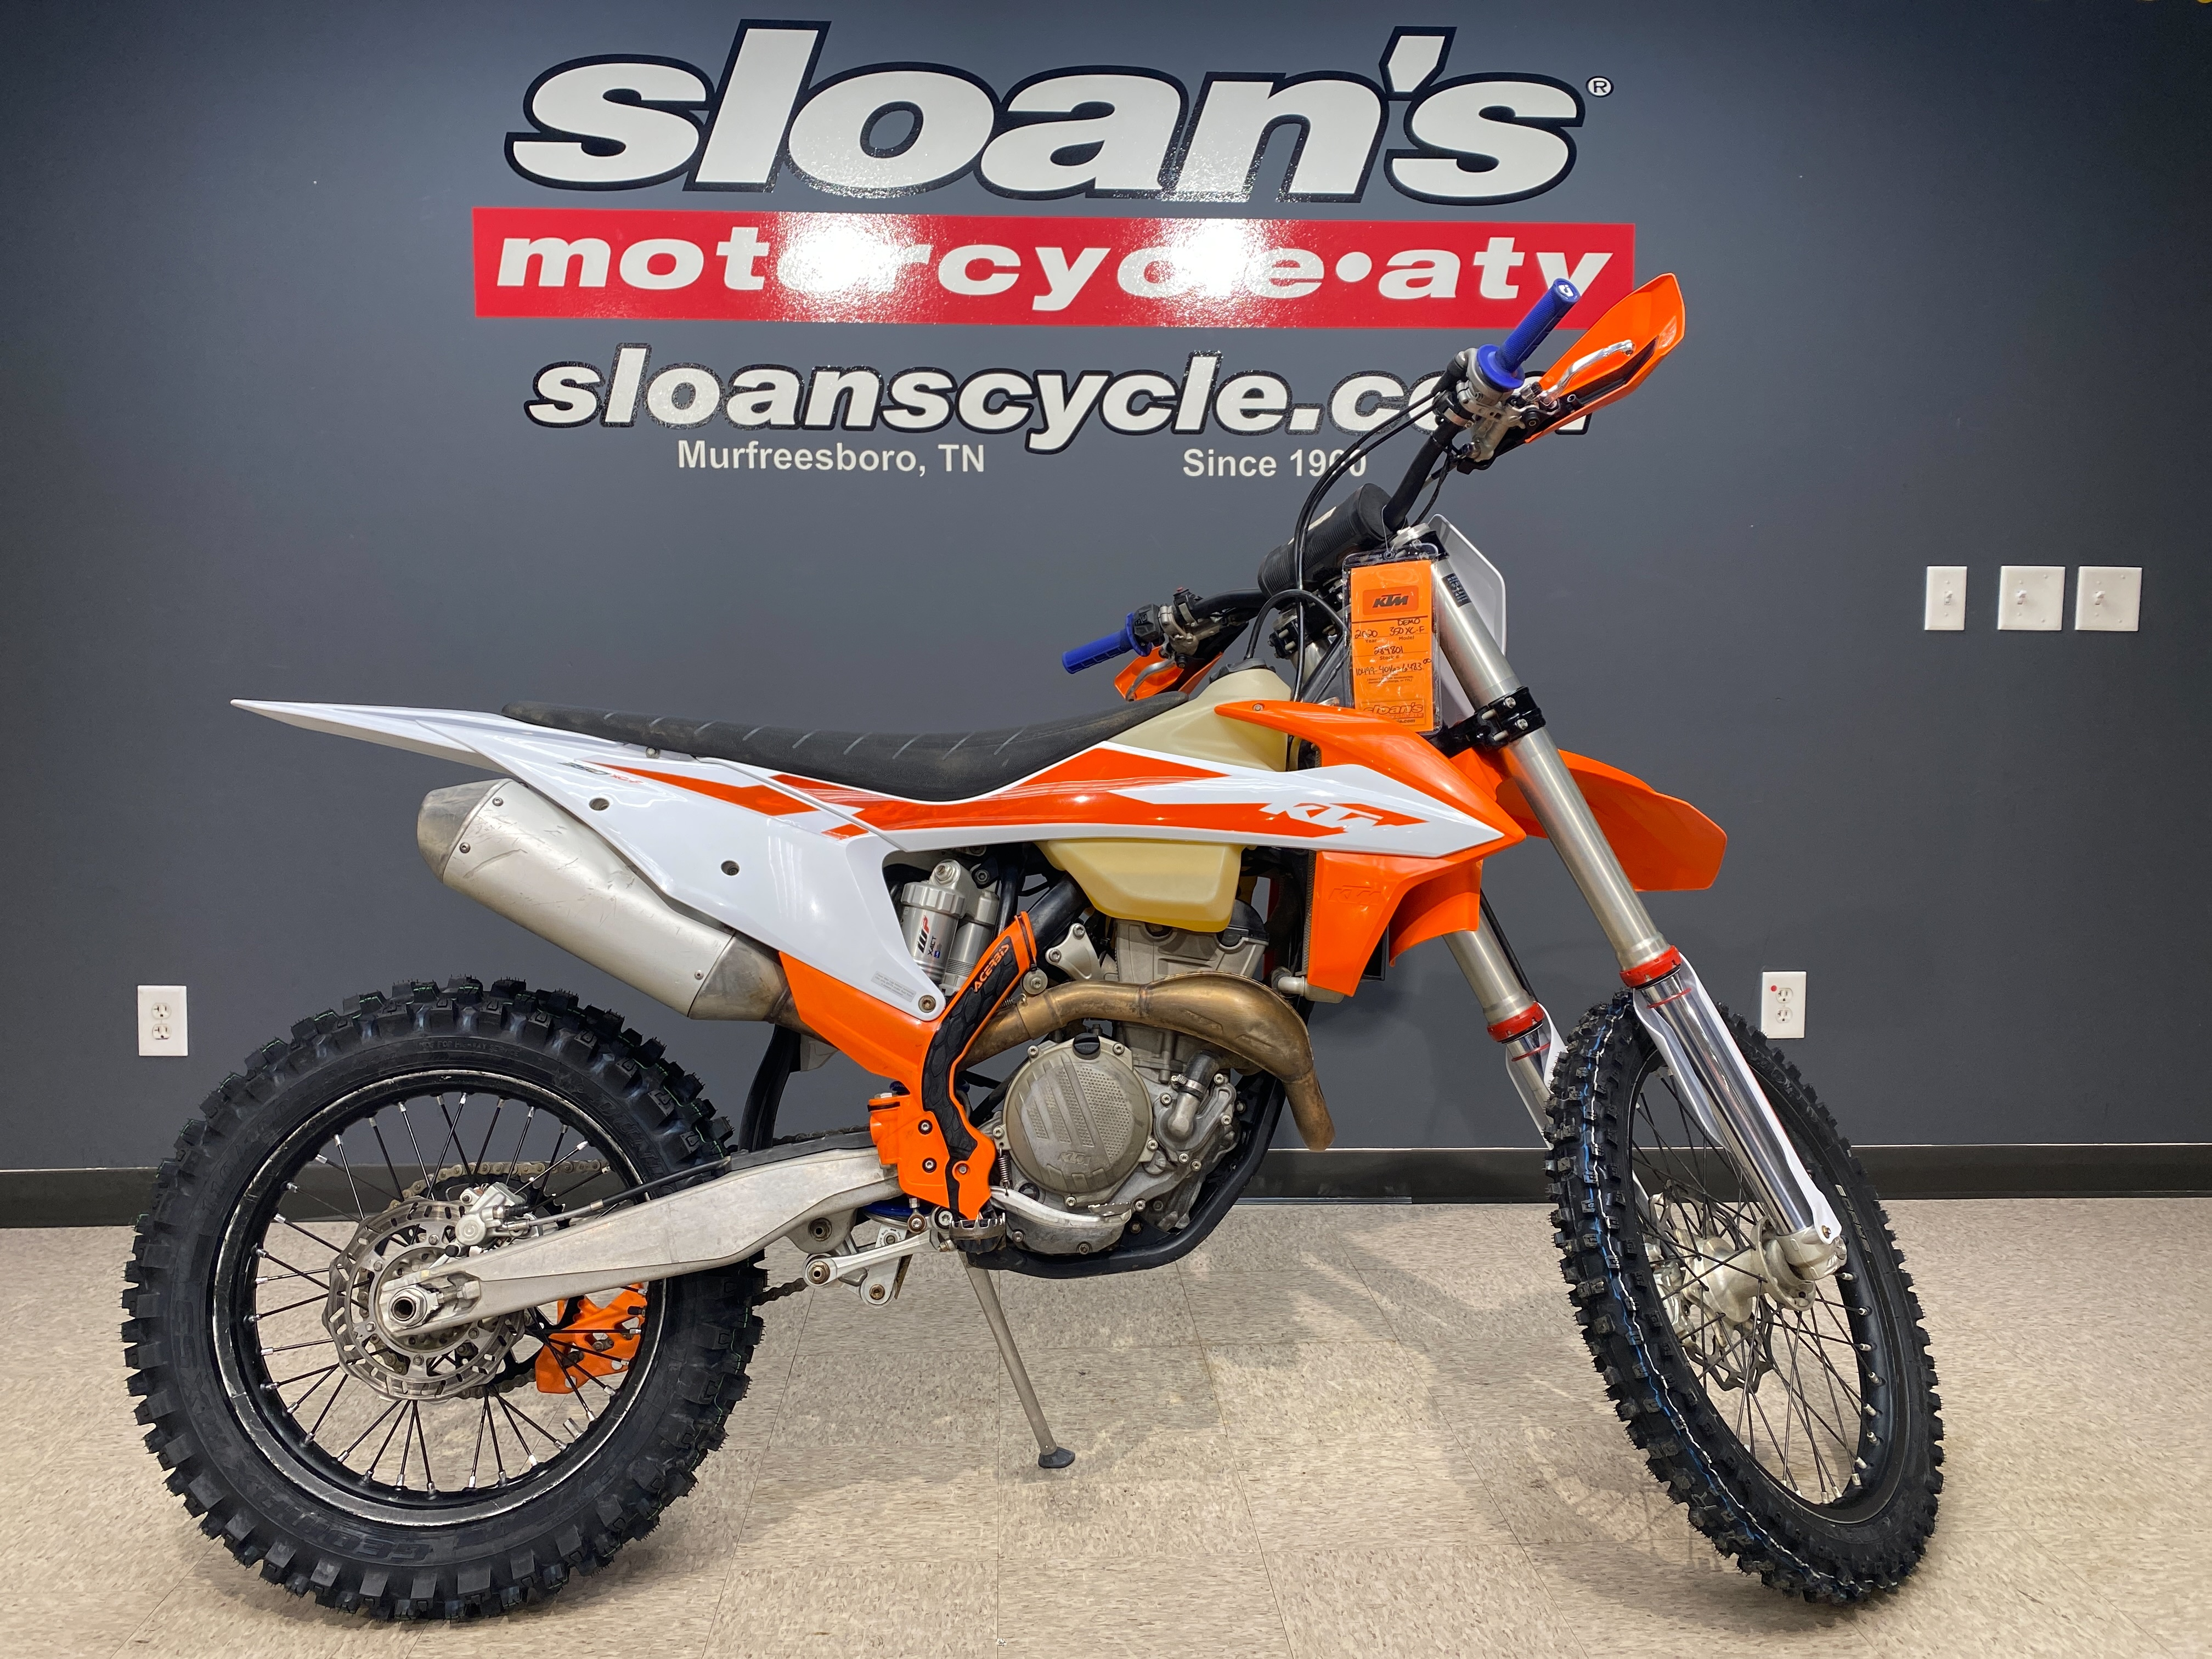 2020 KTM XC 350 F at Sloans Motorcycle ATV, Murfreesboro, TN, 37129